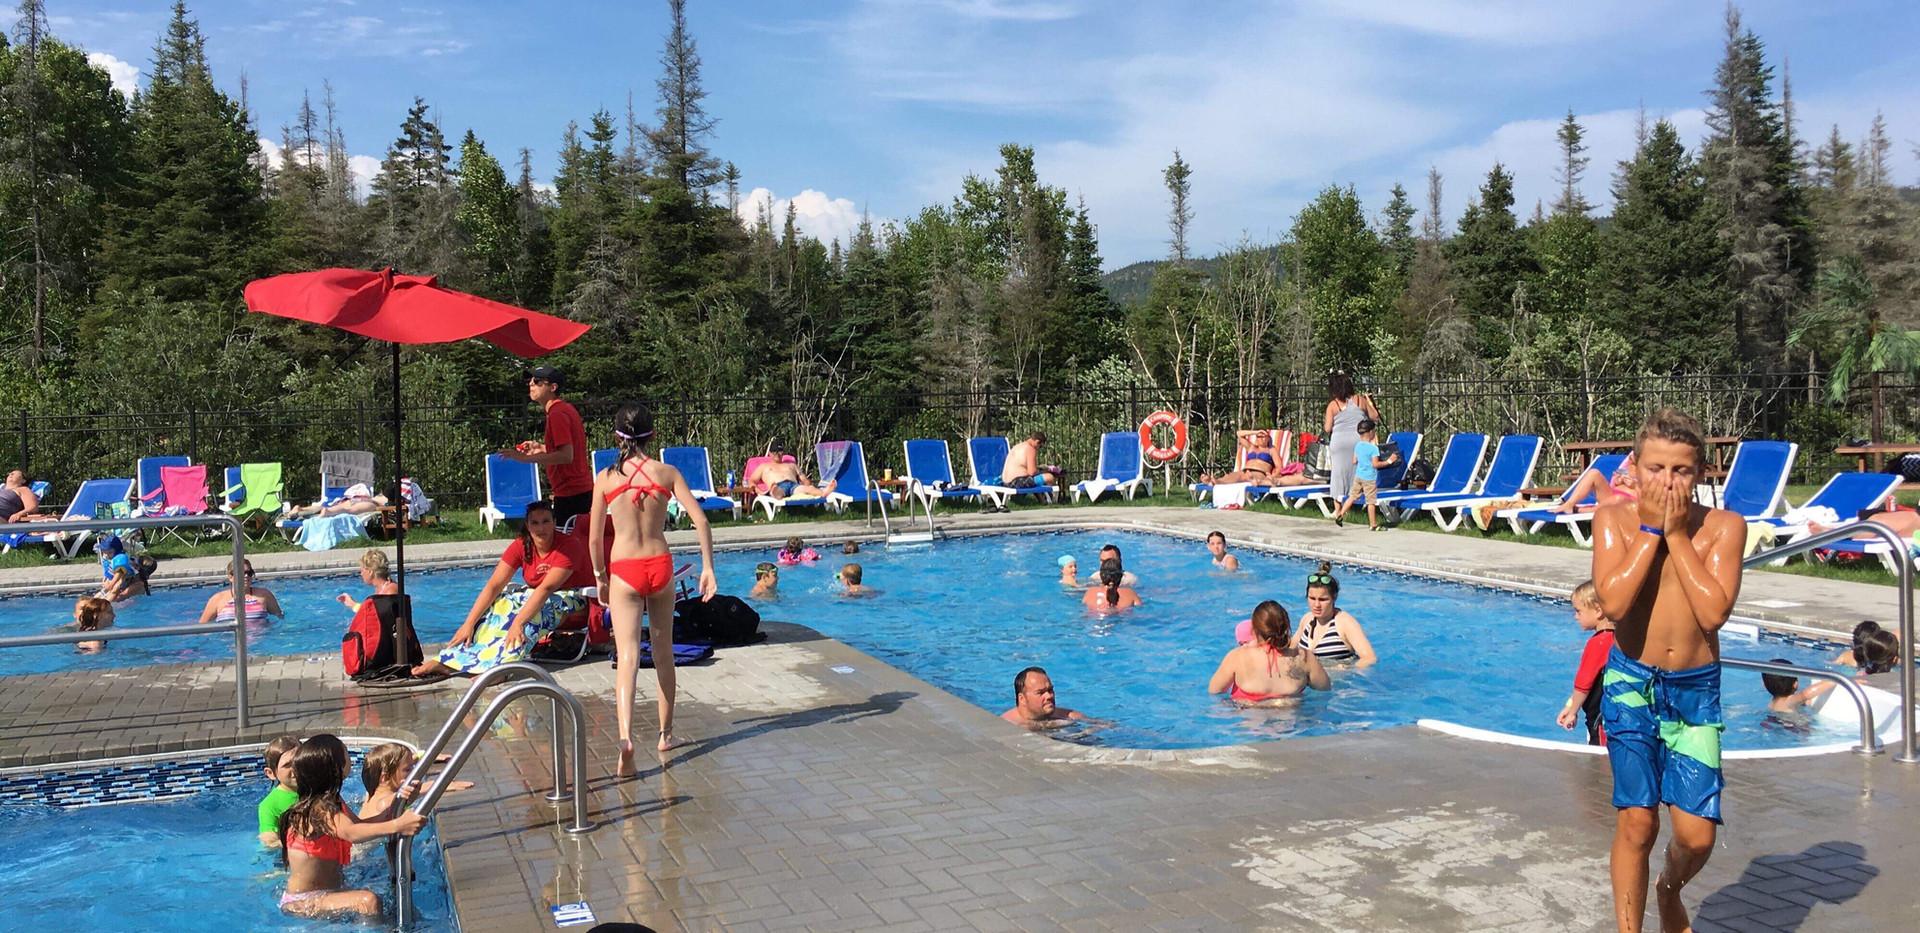 piscine-glissade-eau-camping-boreal-3.JP